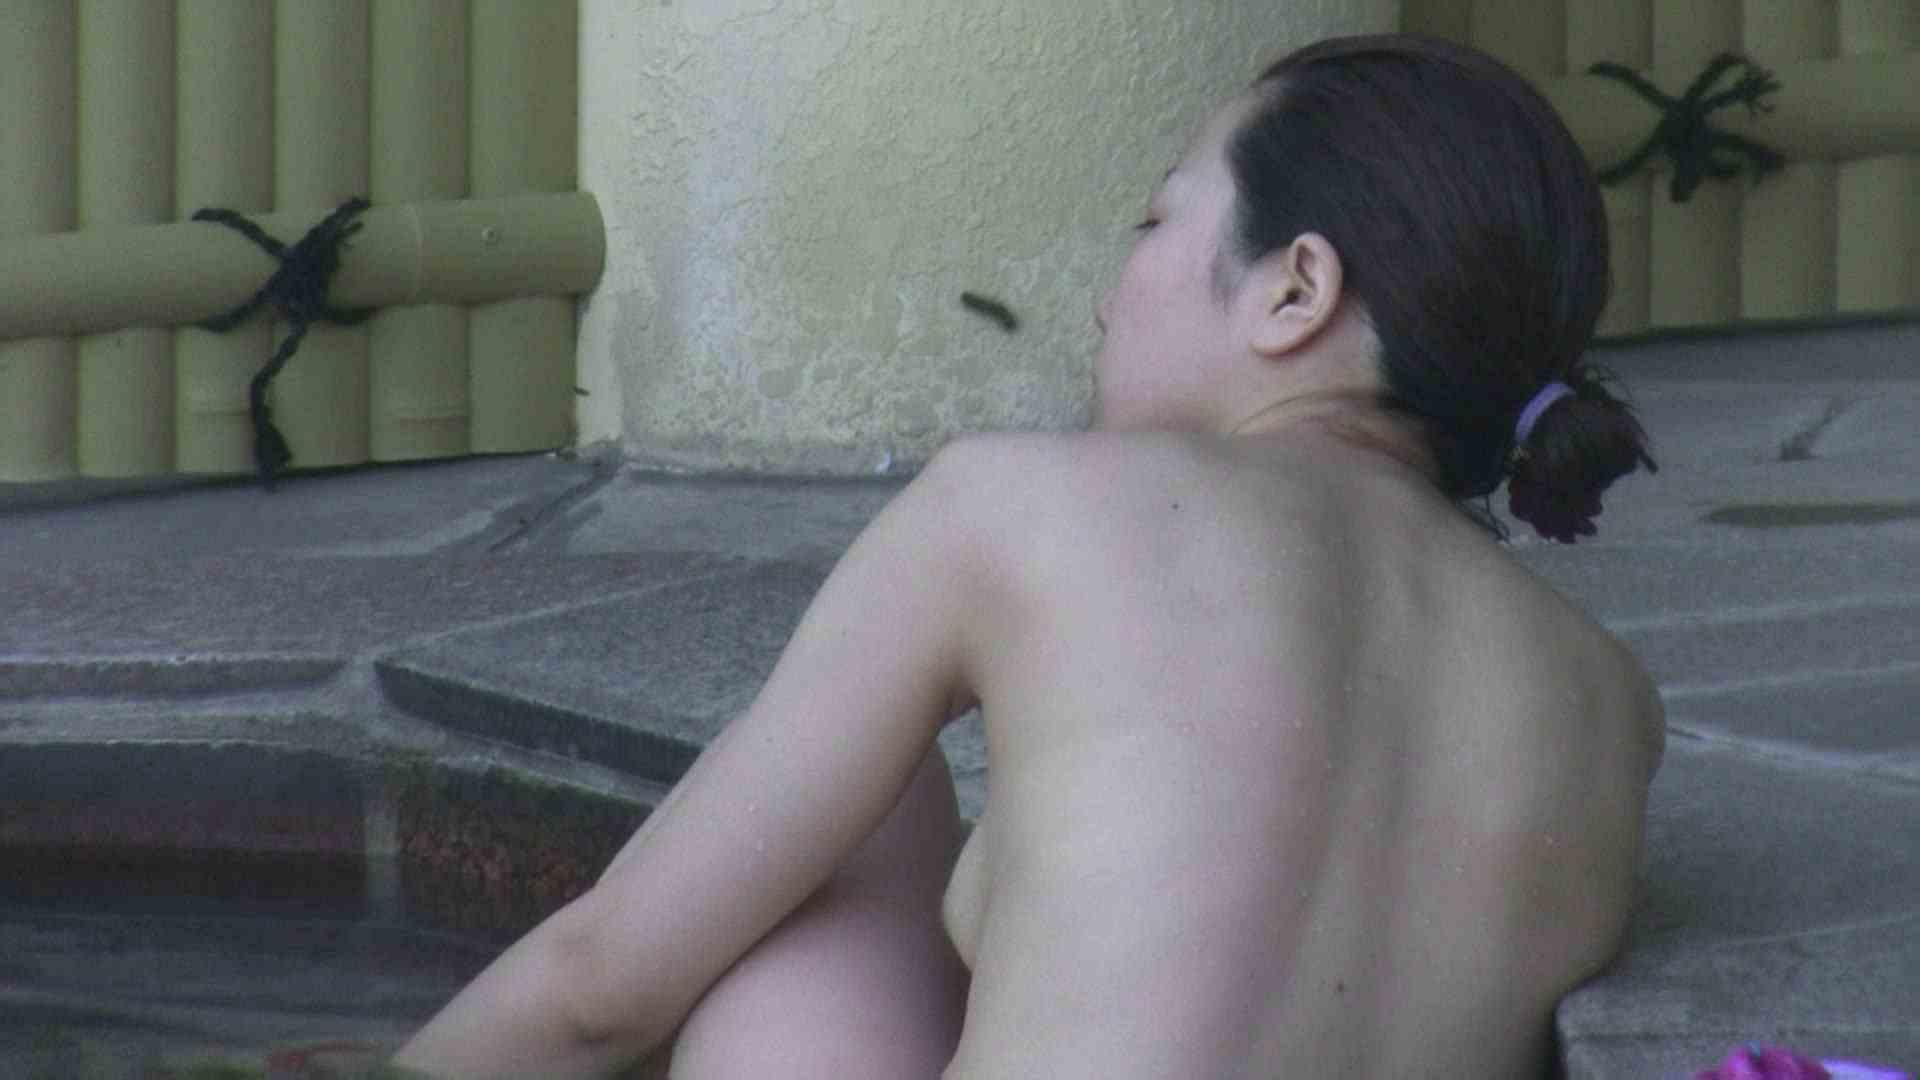 Aquaな露天風呂Vol.88【VIP限定】 綺麗なOLたち | 盗撮  57枚 52